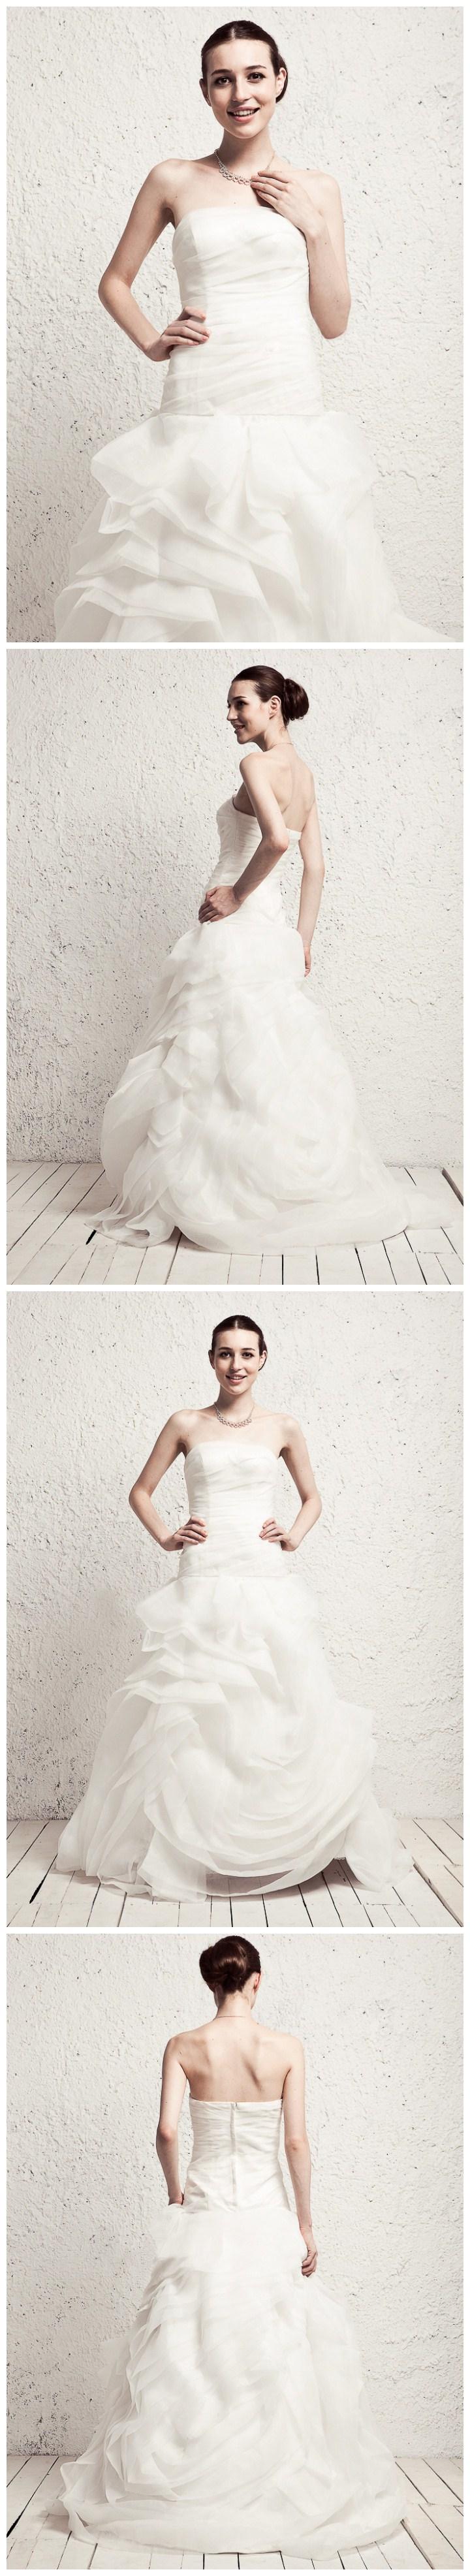 Elegant dropped waist with ruffled flower style skirt wedding dress